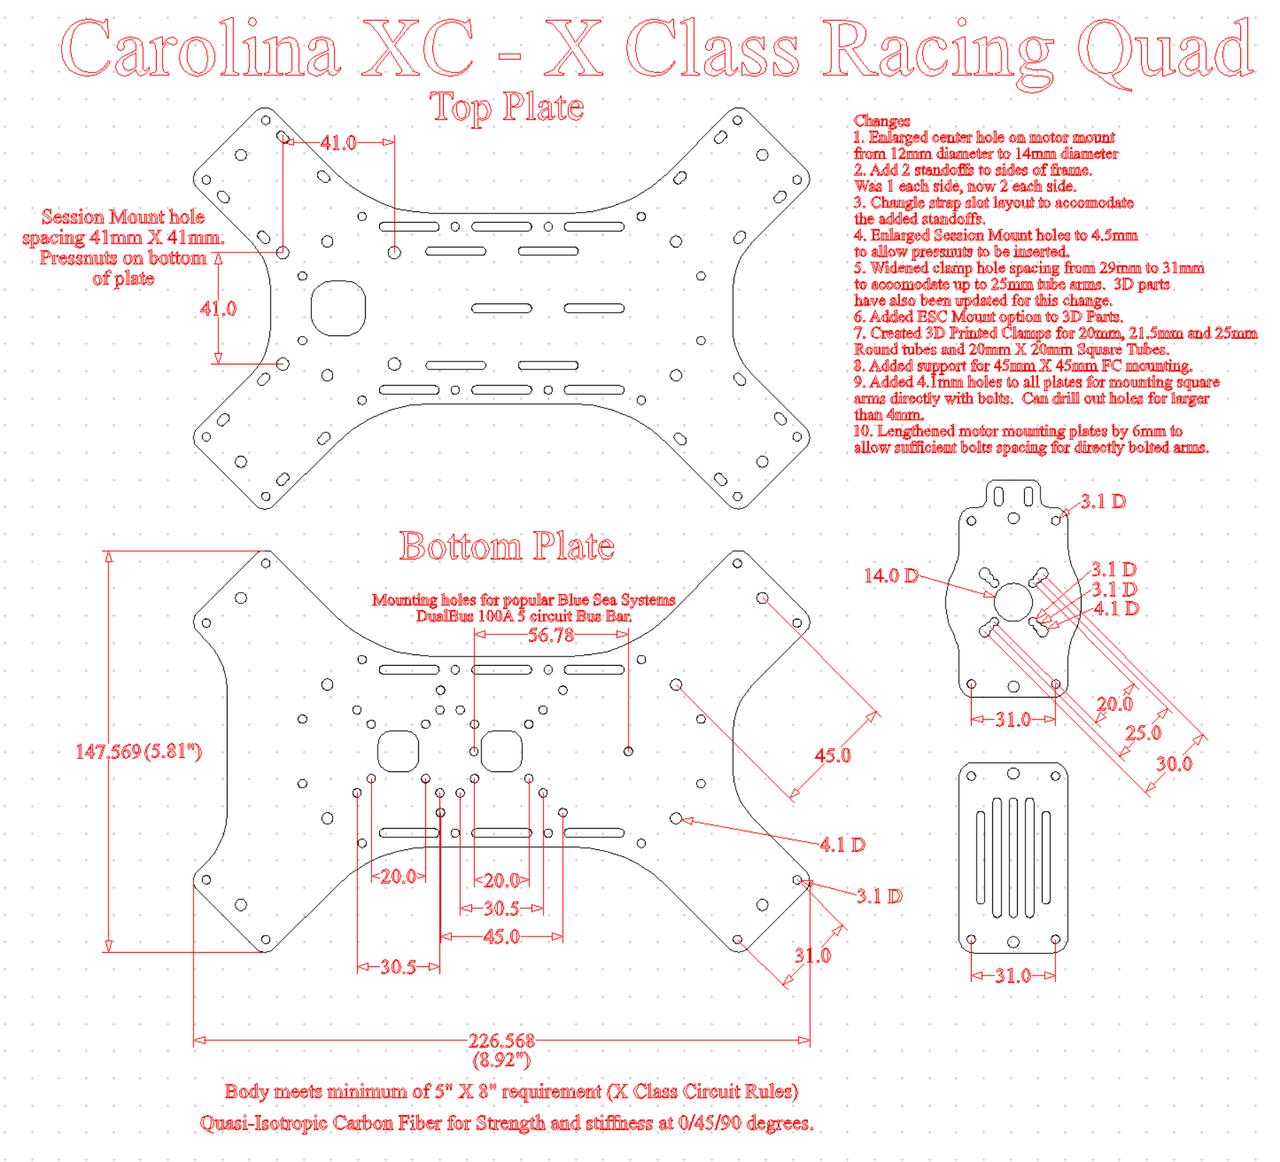 Carolina XC X Class Frame CAD (Free Download) - Plastic-Spider